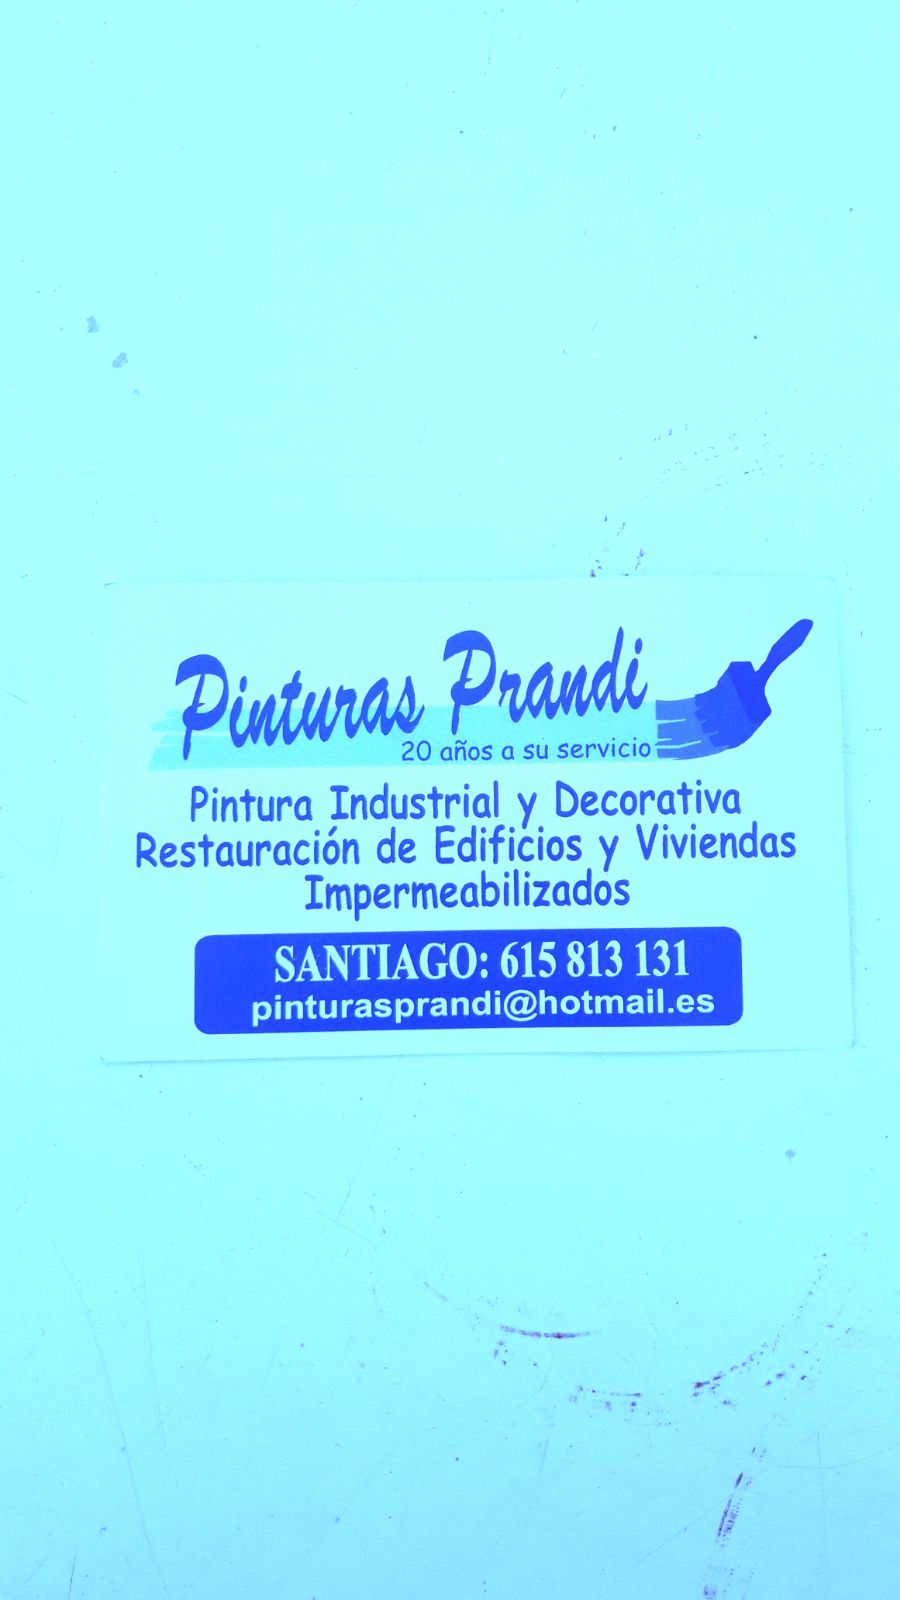 Pinturas Prandi